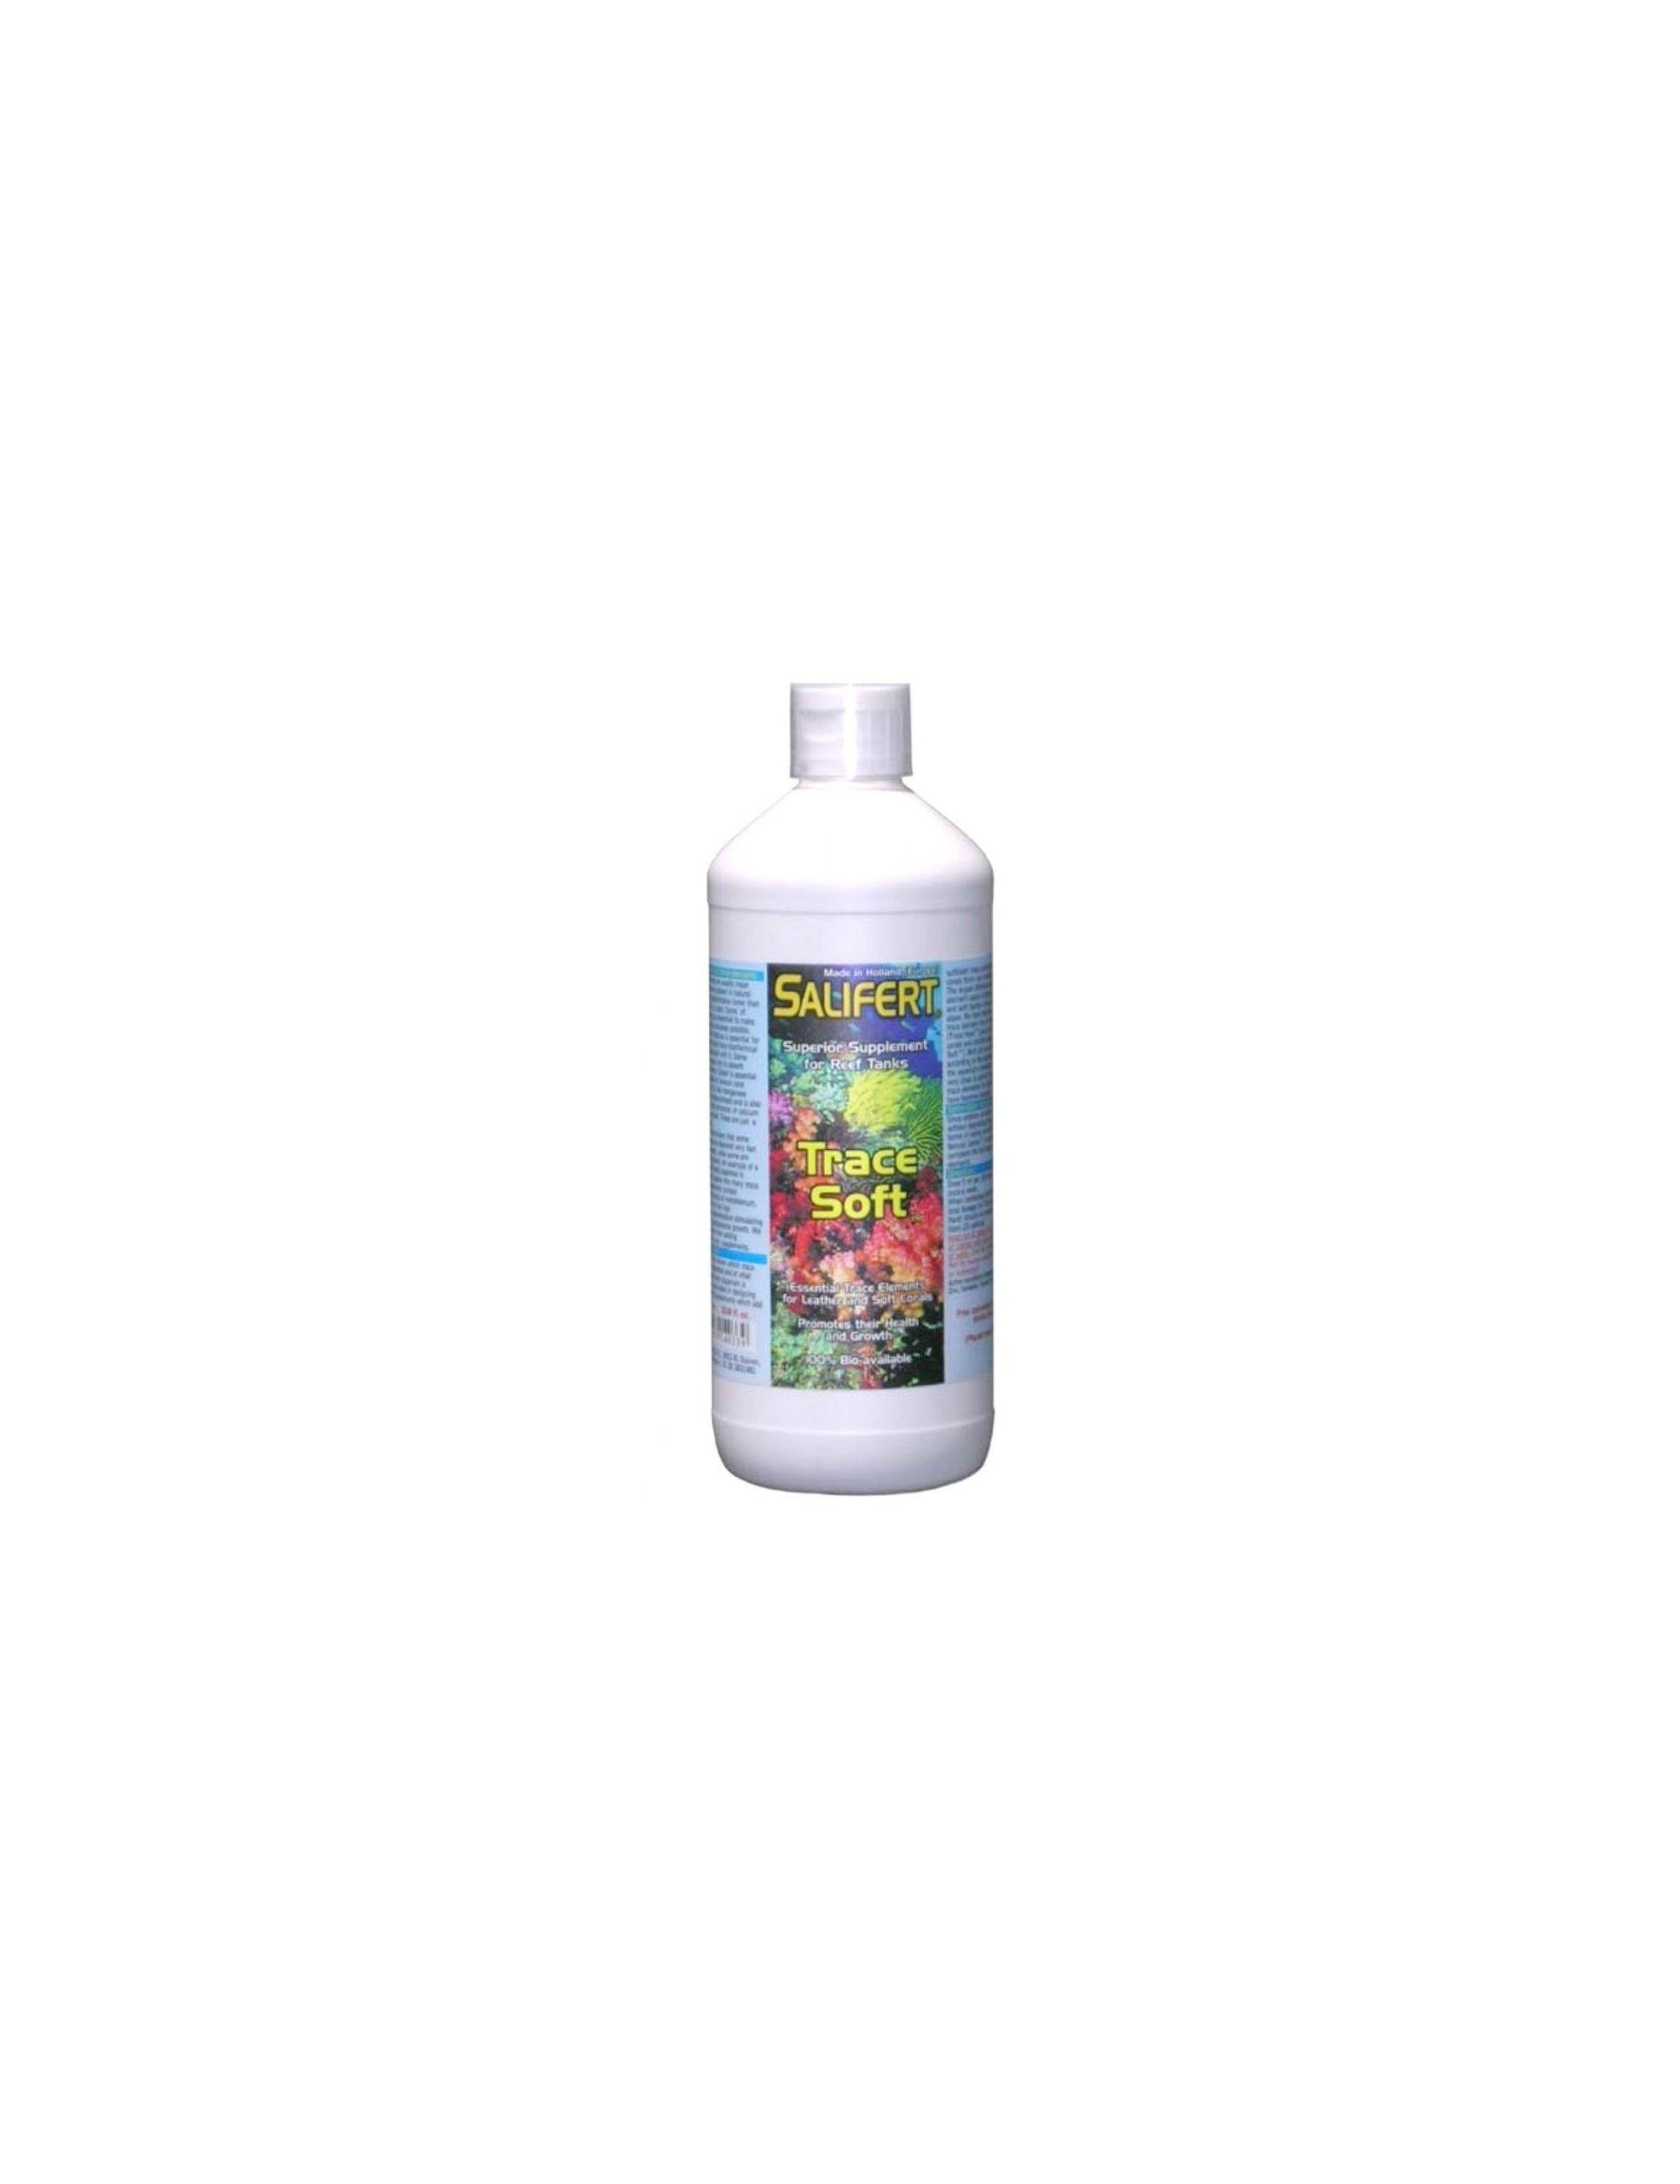 SALIFERT - Trace Soft 500 ml